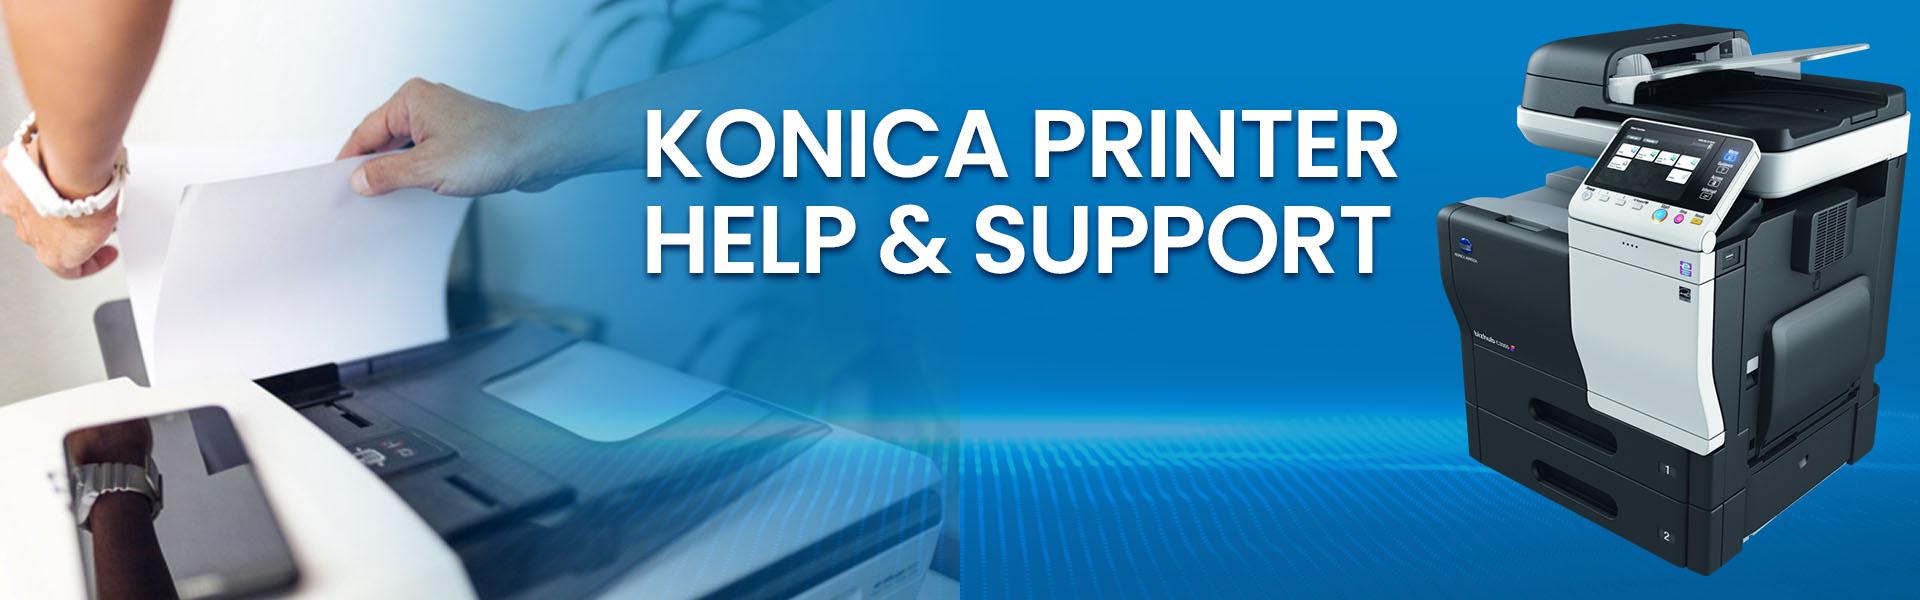 konica printer help-support